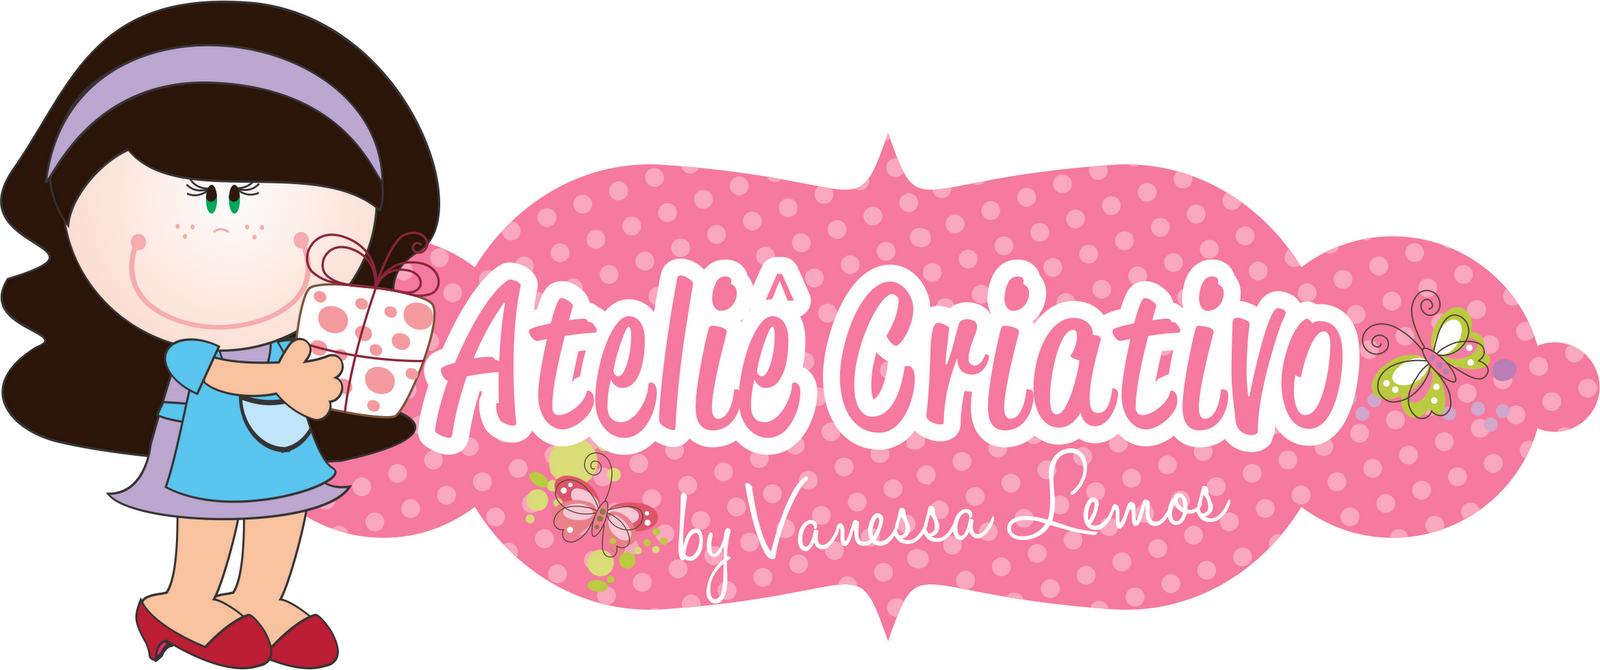 Ateliê Criativo By Vanessa Lemos